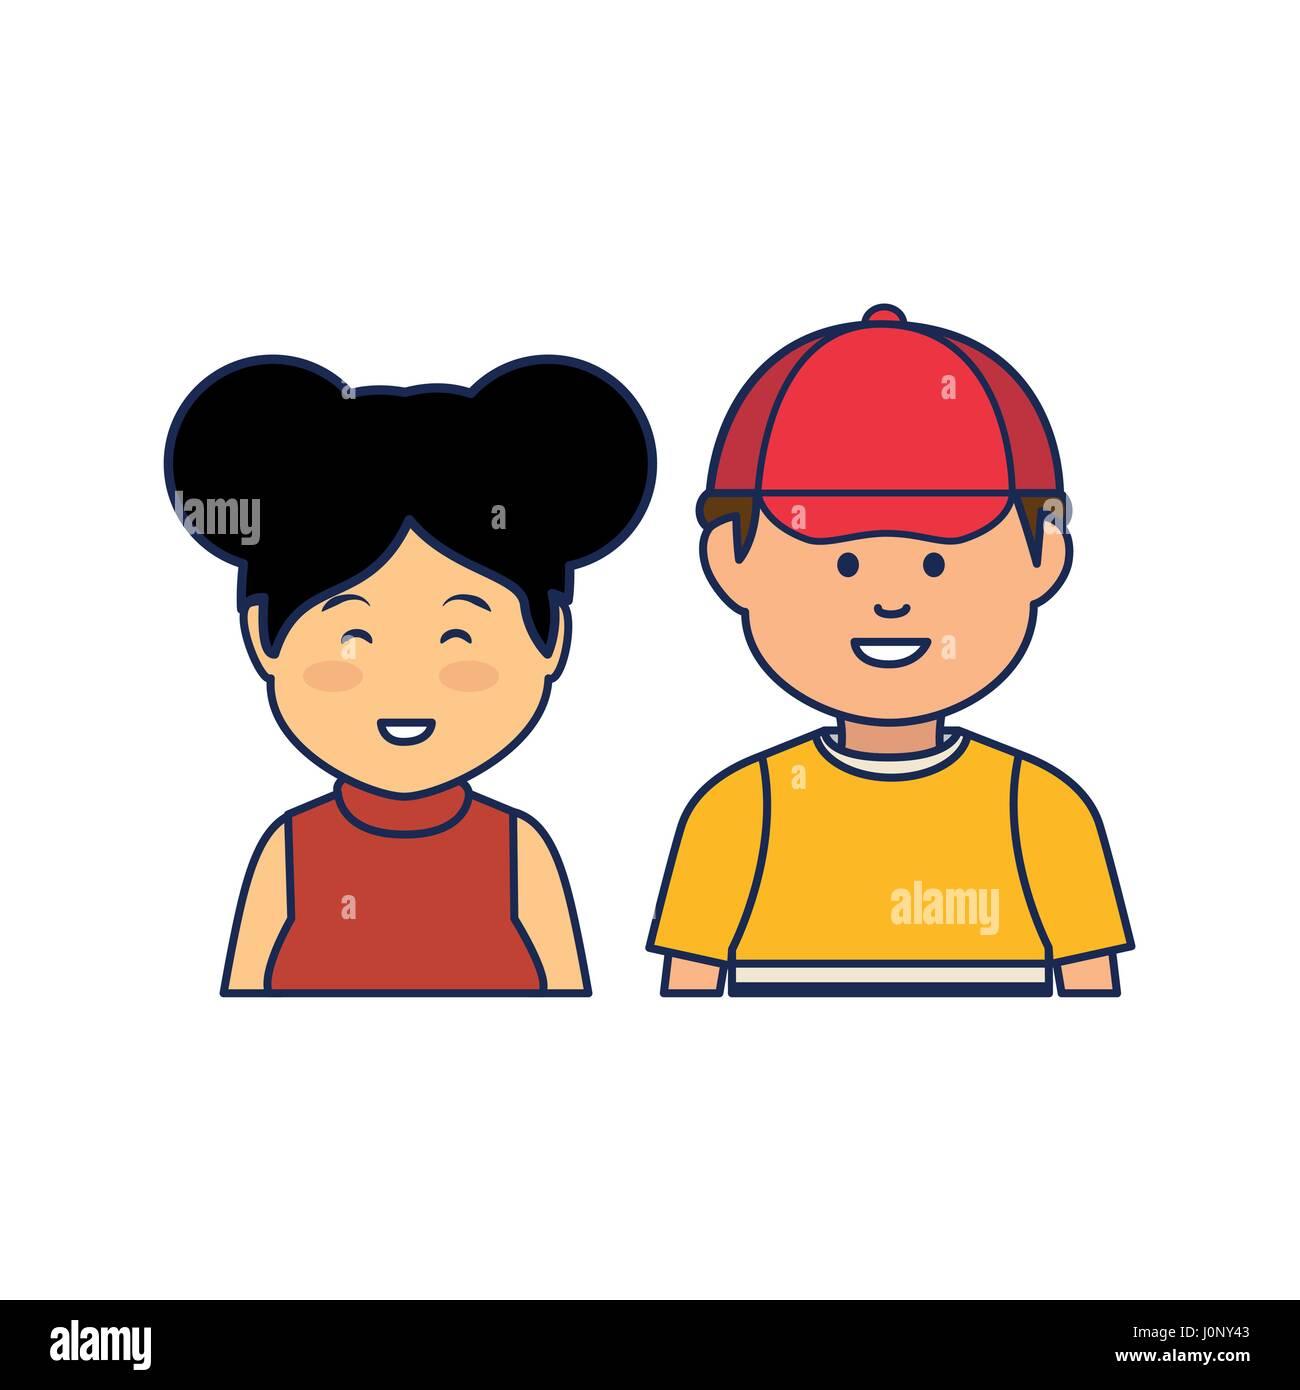 Jóvenes de etnia caracteres Imagen De Stock